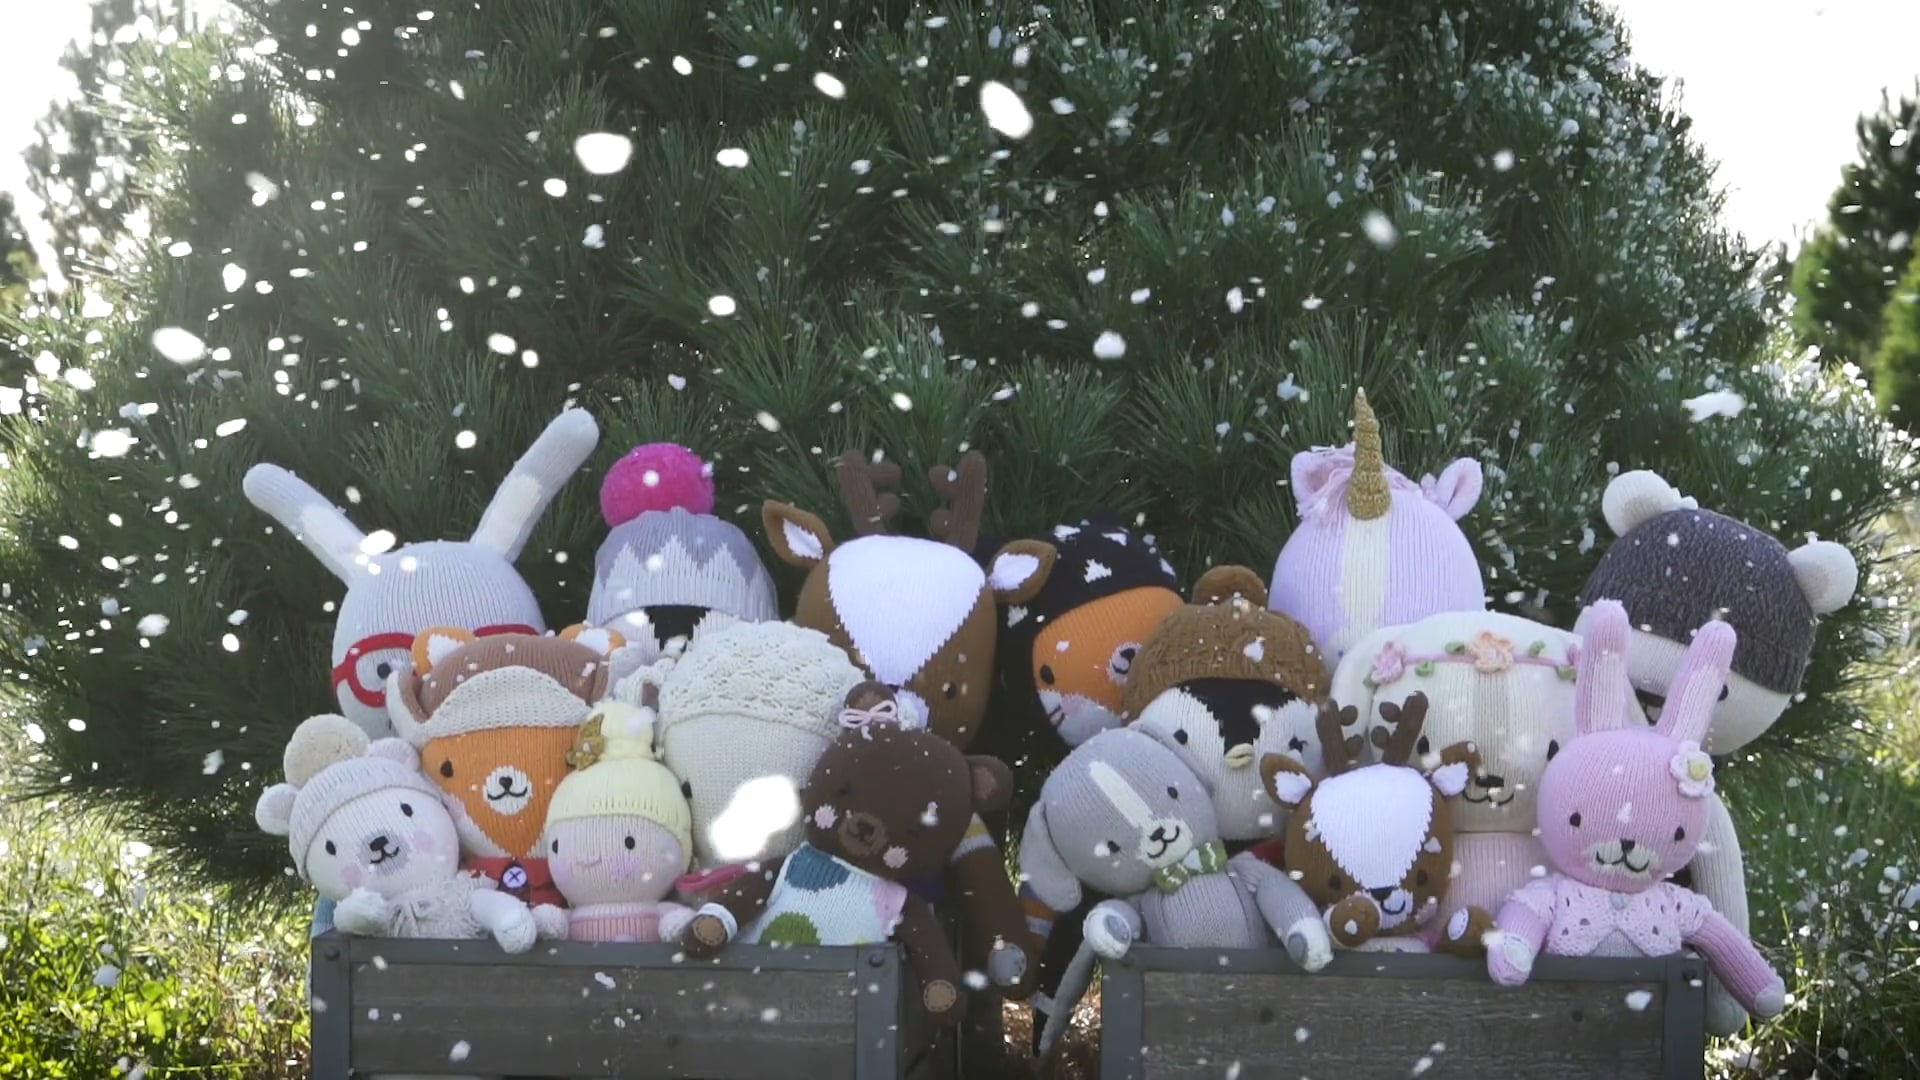 CUDDLE+KIND A Christmas Campaign